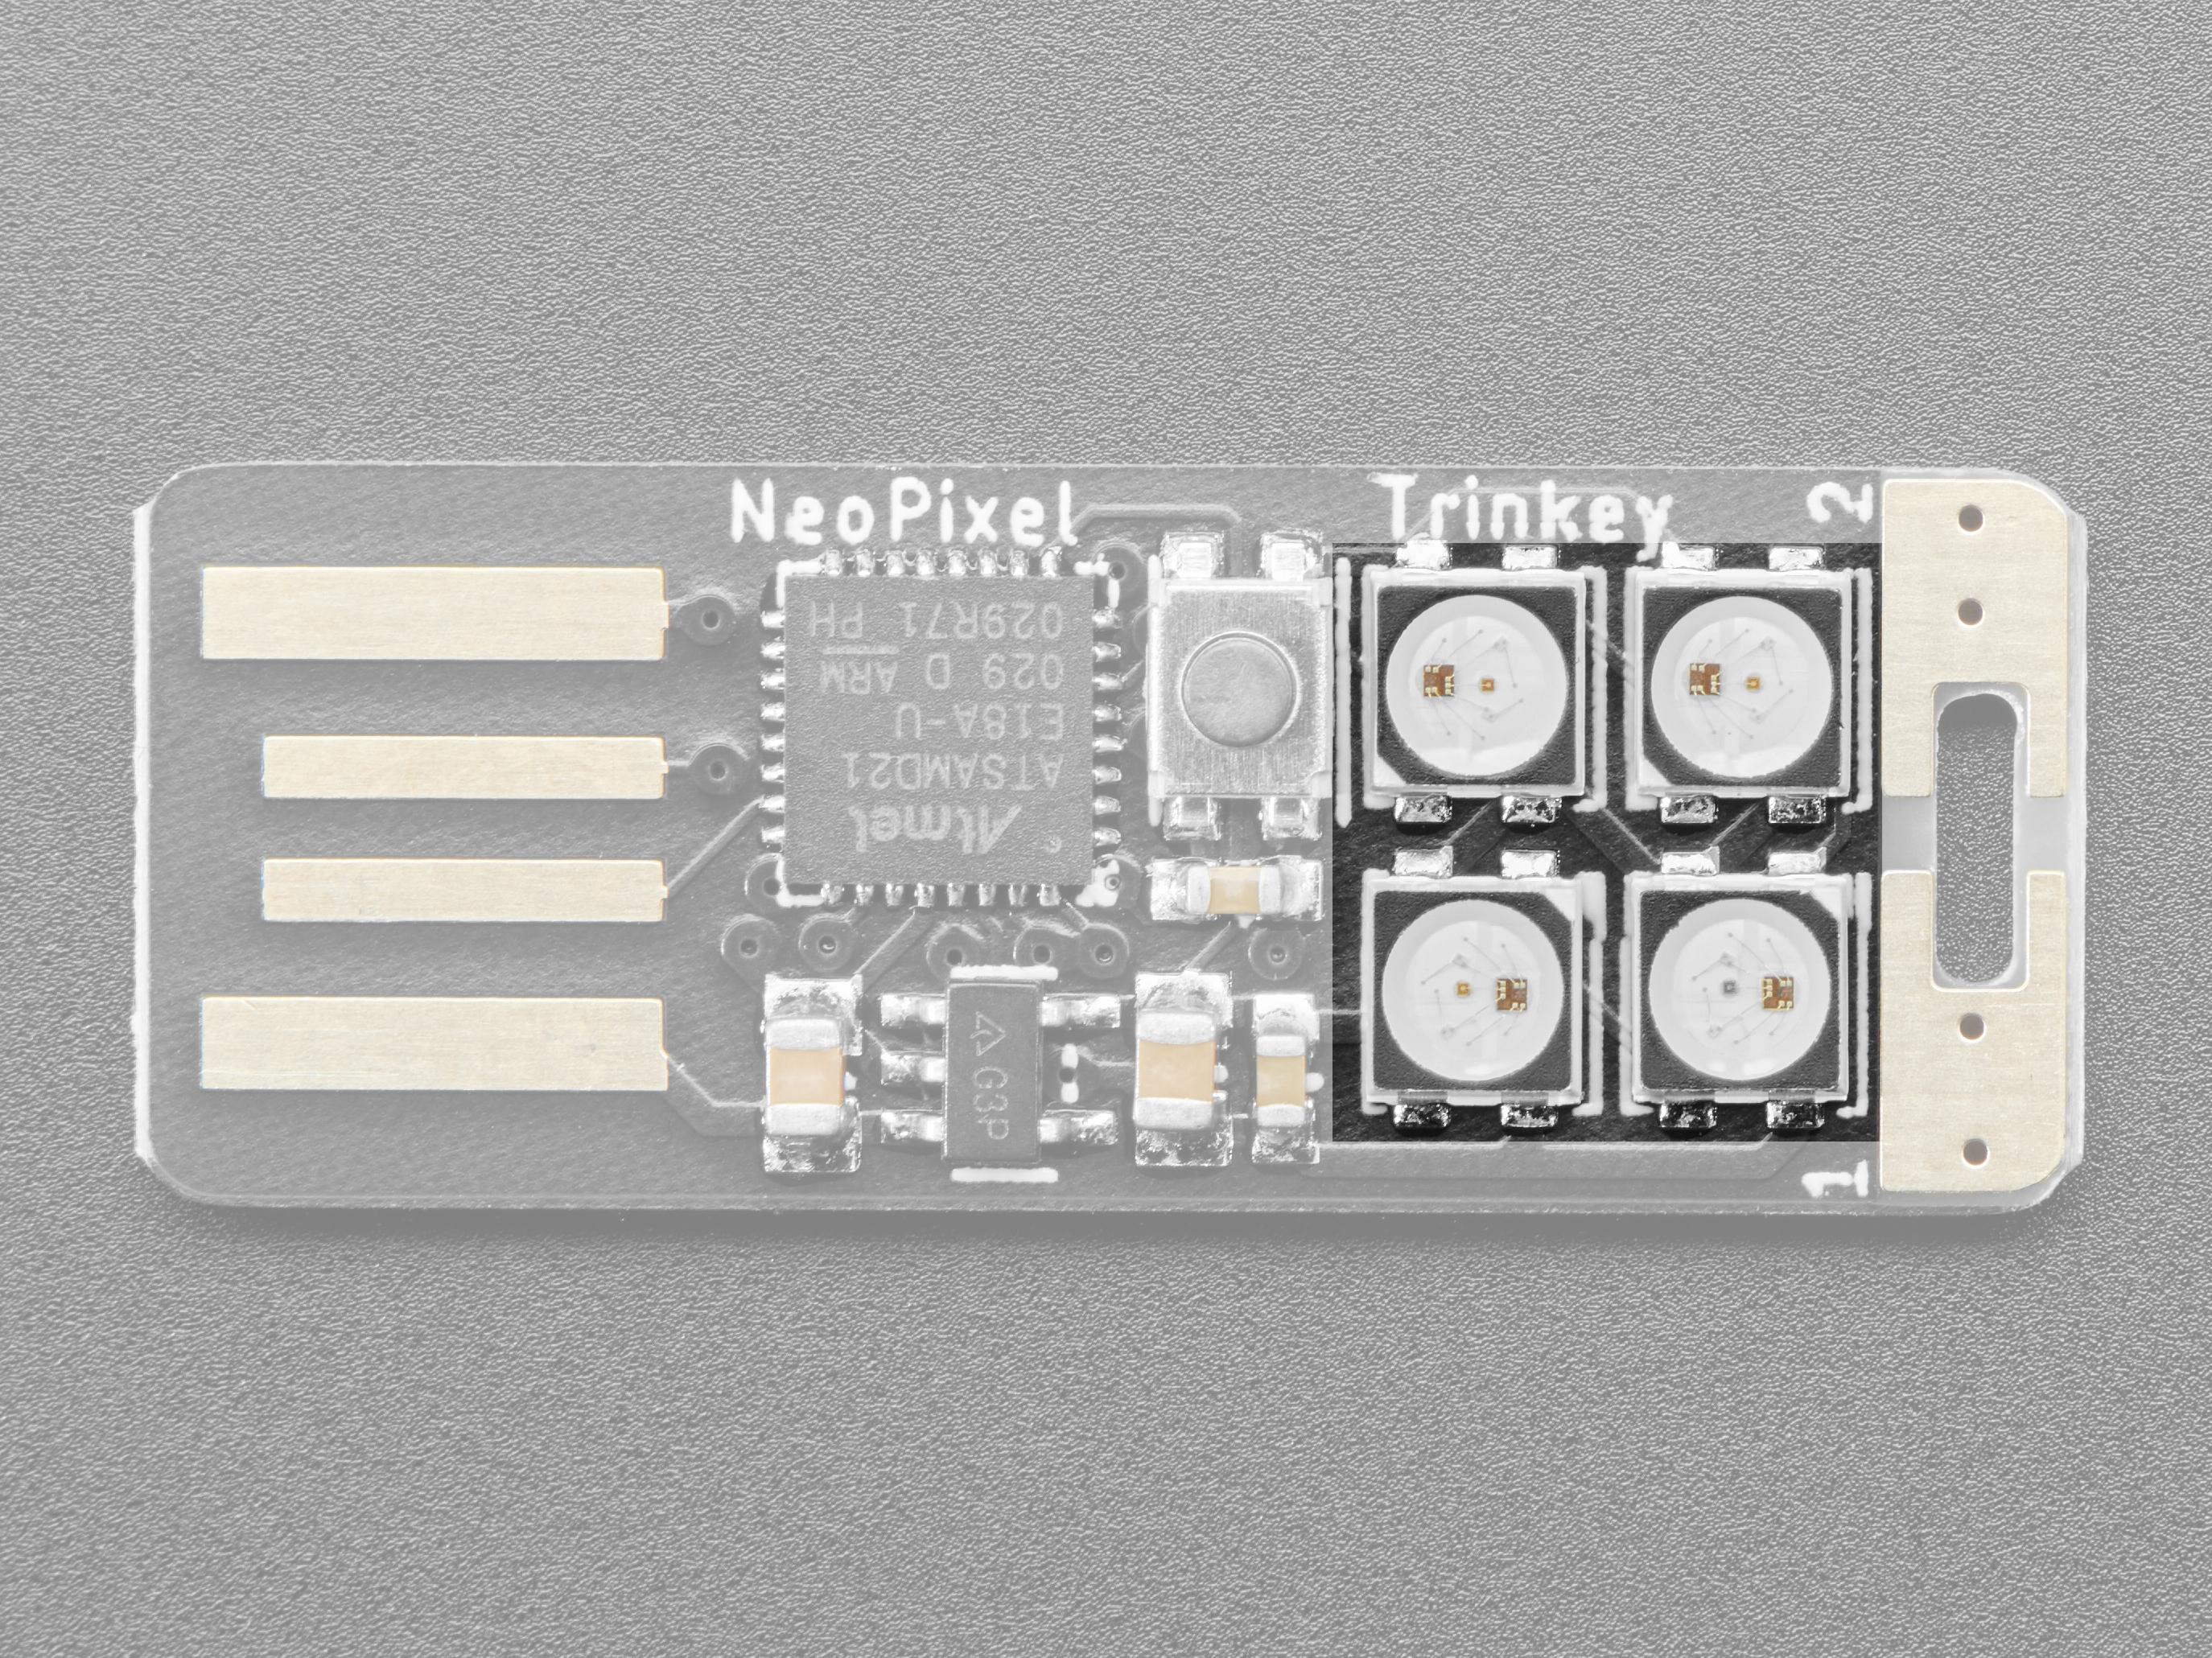 adafruit_products_NeoT_pinouts_NeoPixels.jpg